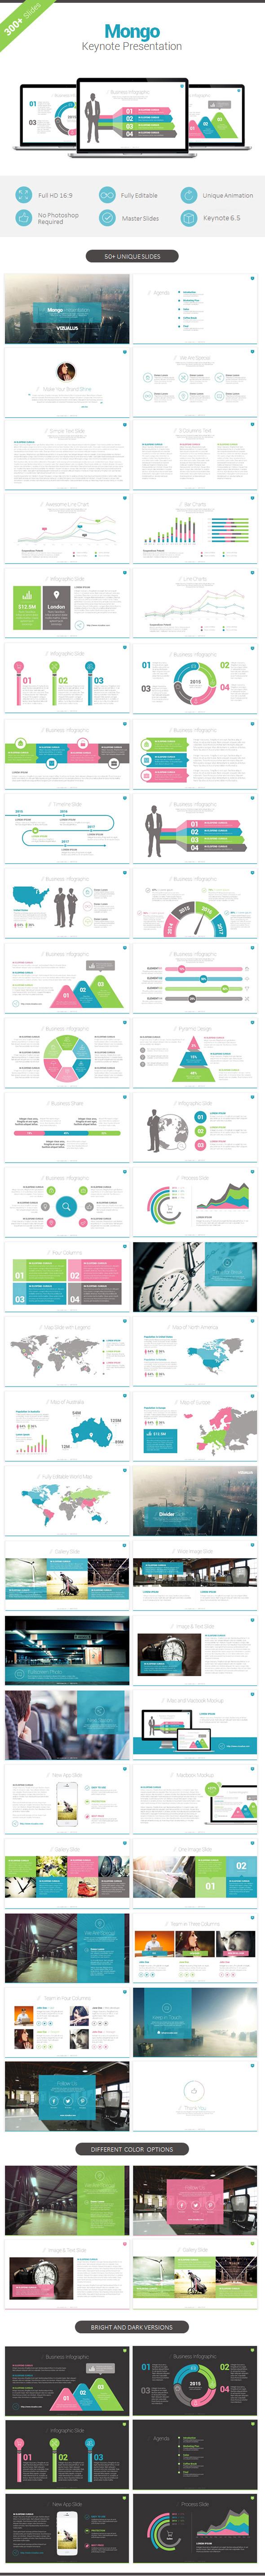 Mongo Keynote Template - Keynote Templates Presentation Templates